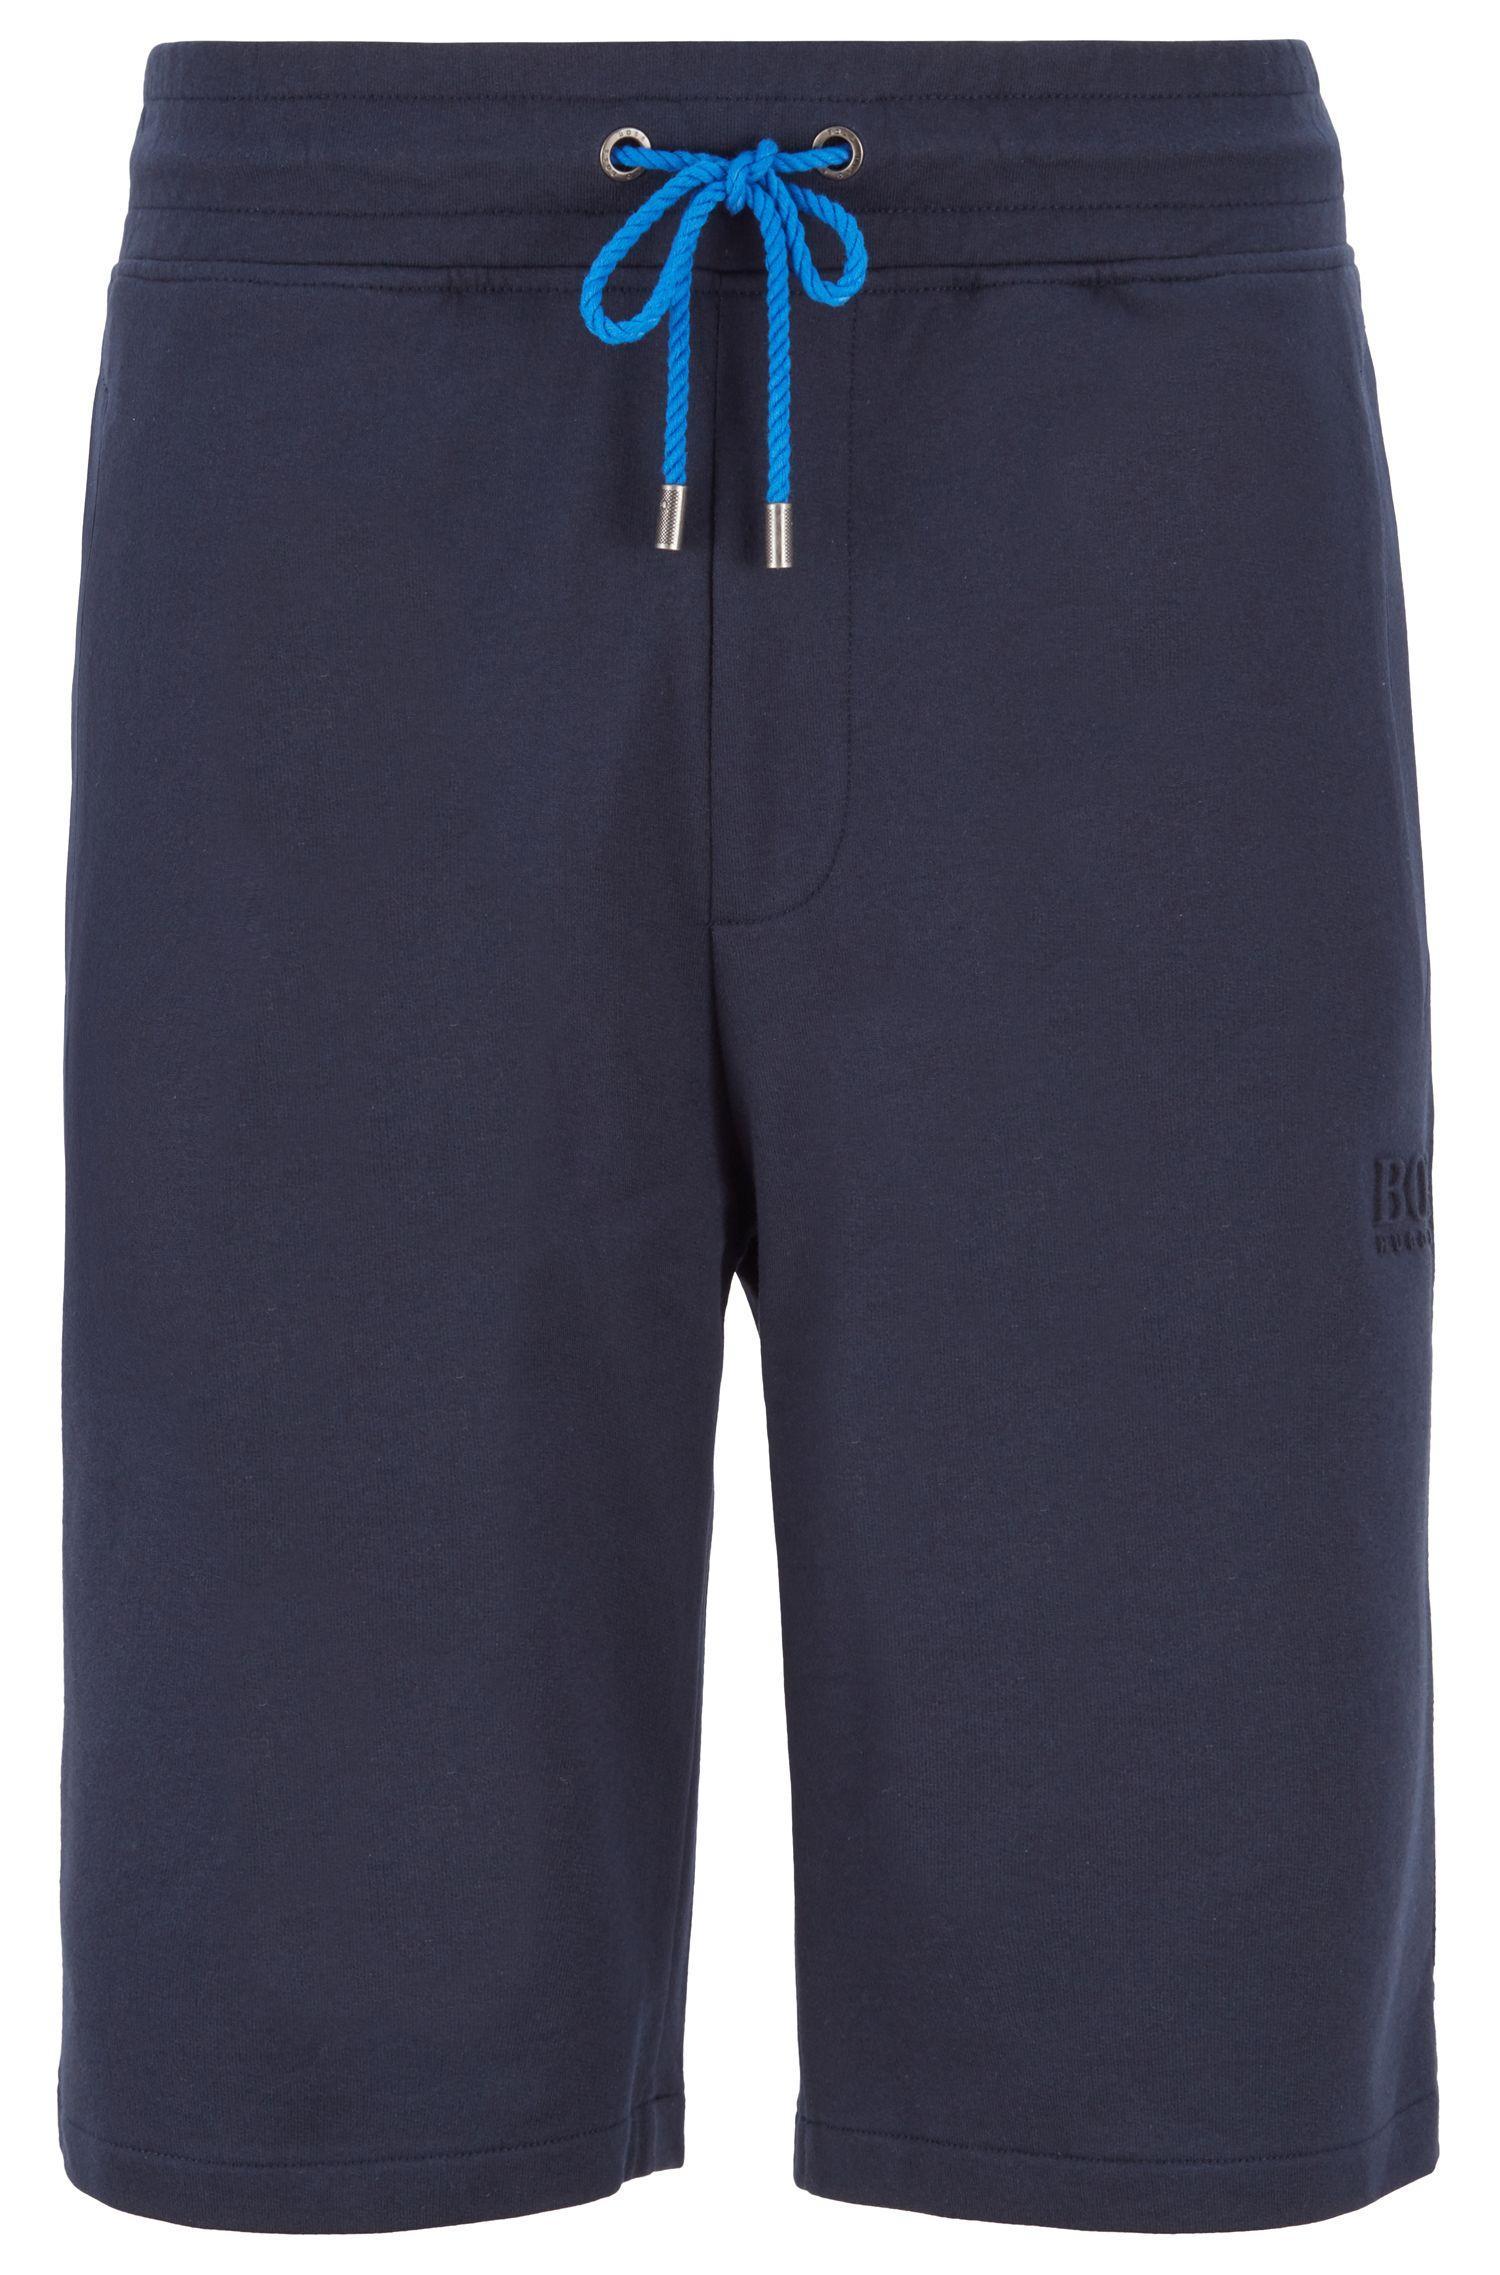 c008e5b1e8 BOSS Loungewear Shorts In Melange French Terry in Blue for Men - Lyst